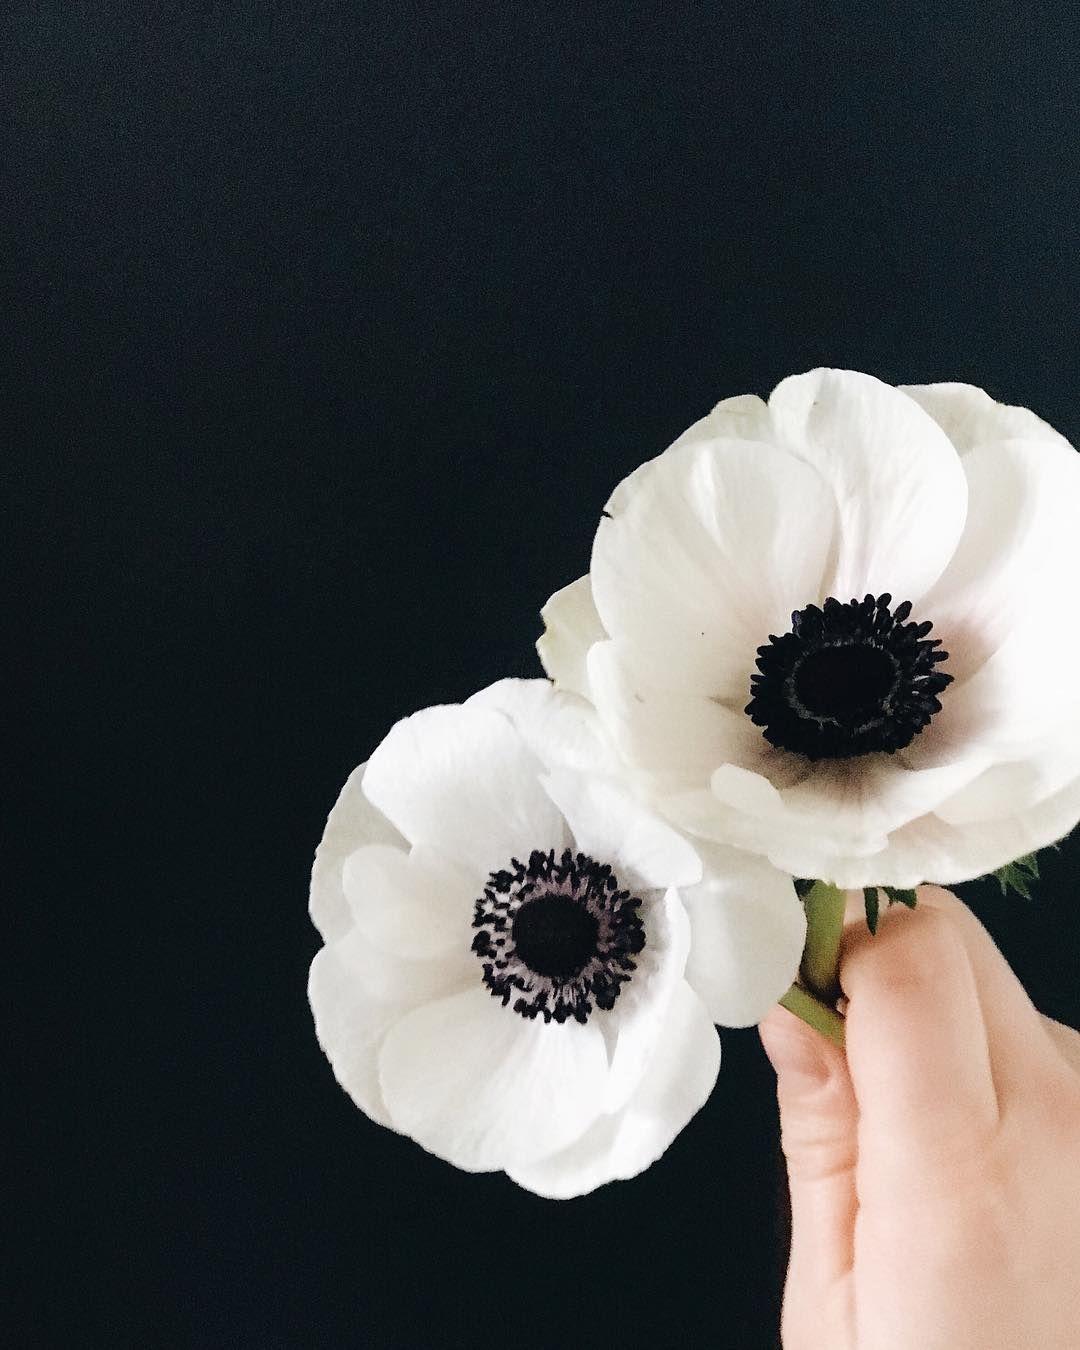 Black And White Anemones Anemone Flower Minimalist Minimalism Anemone Flower White Poppy Flower Anenome Flower